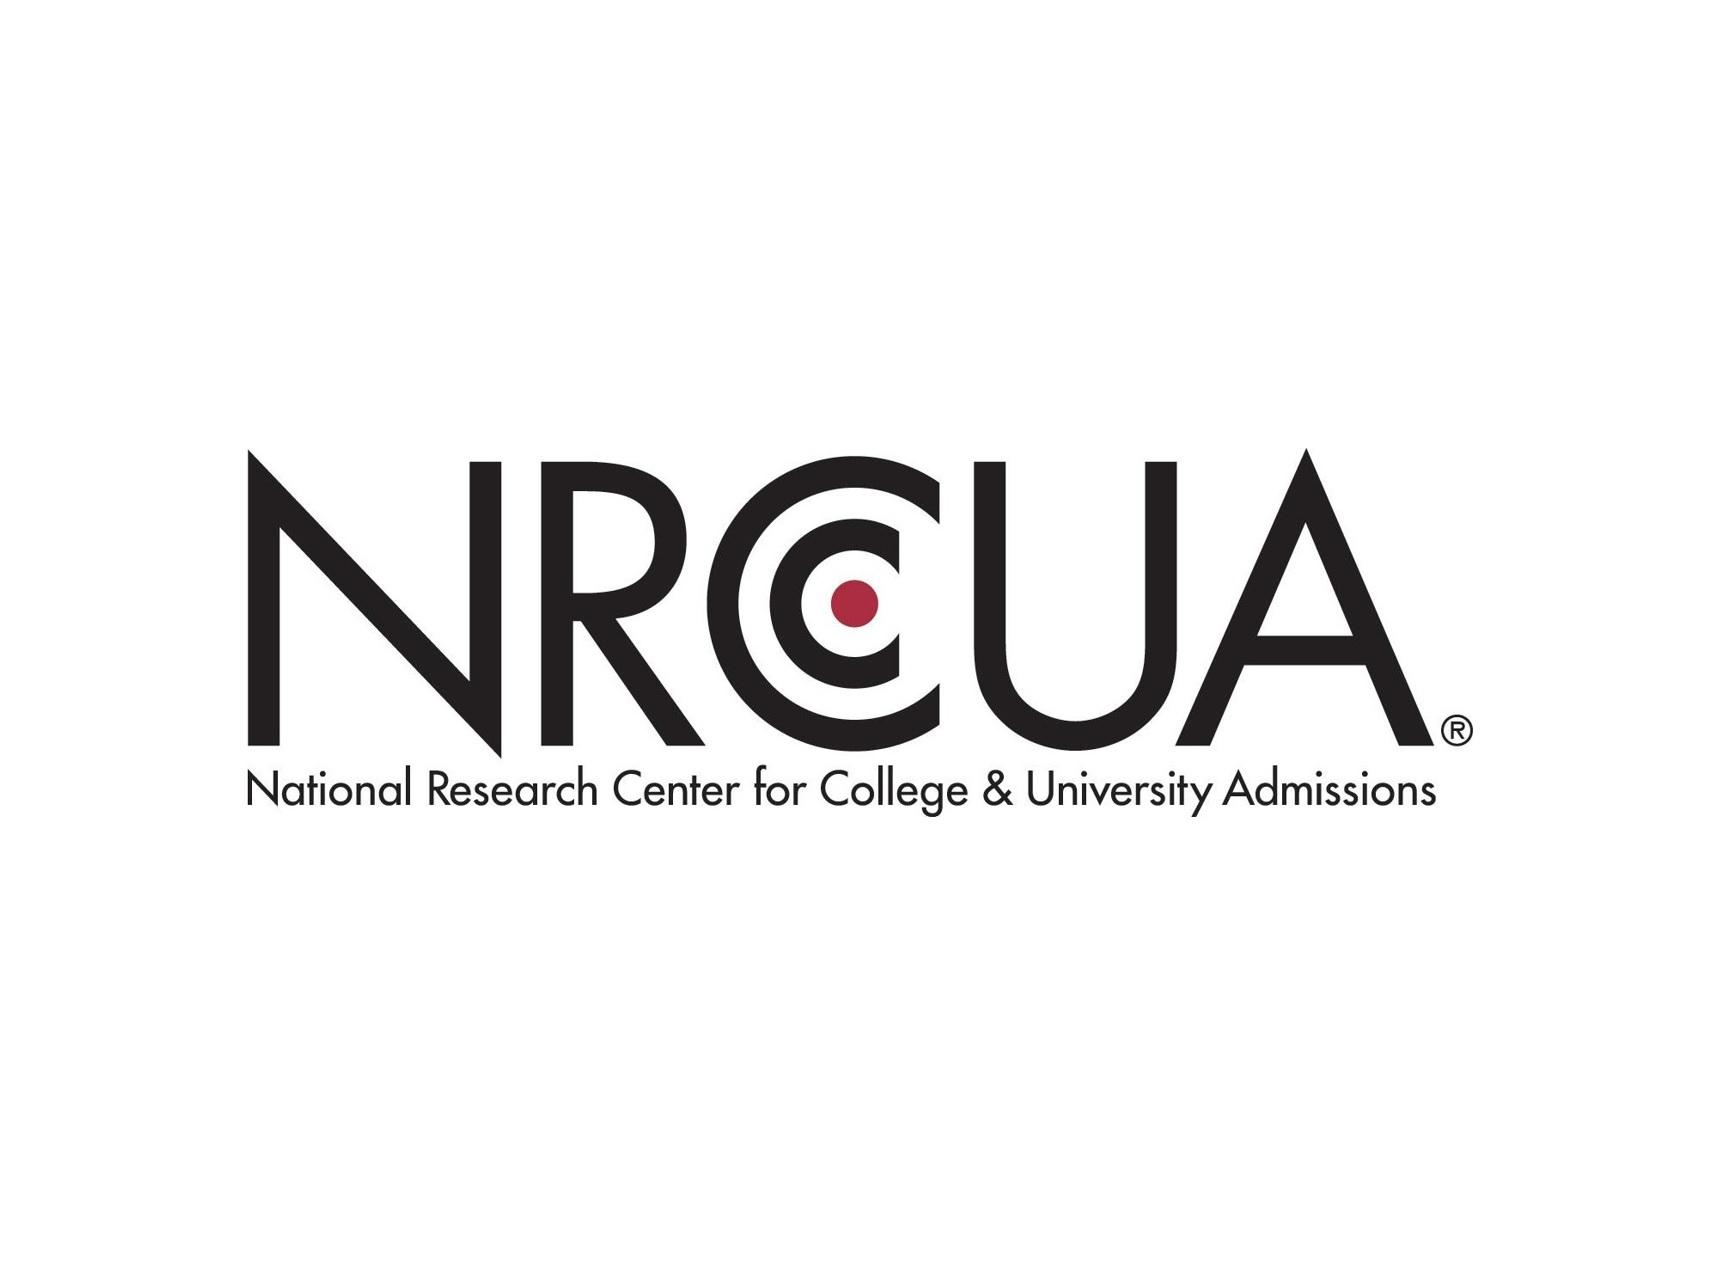 NRCUA logo.jpg